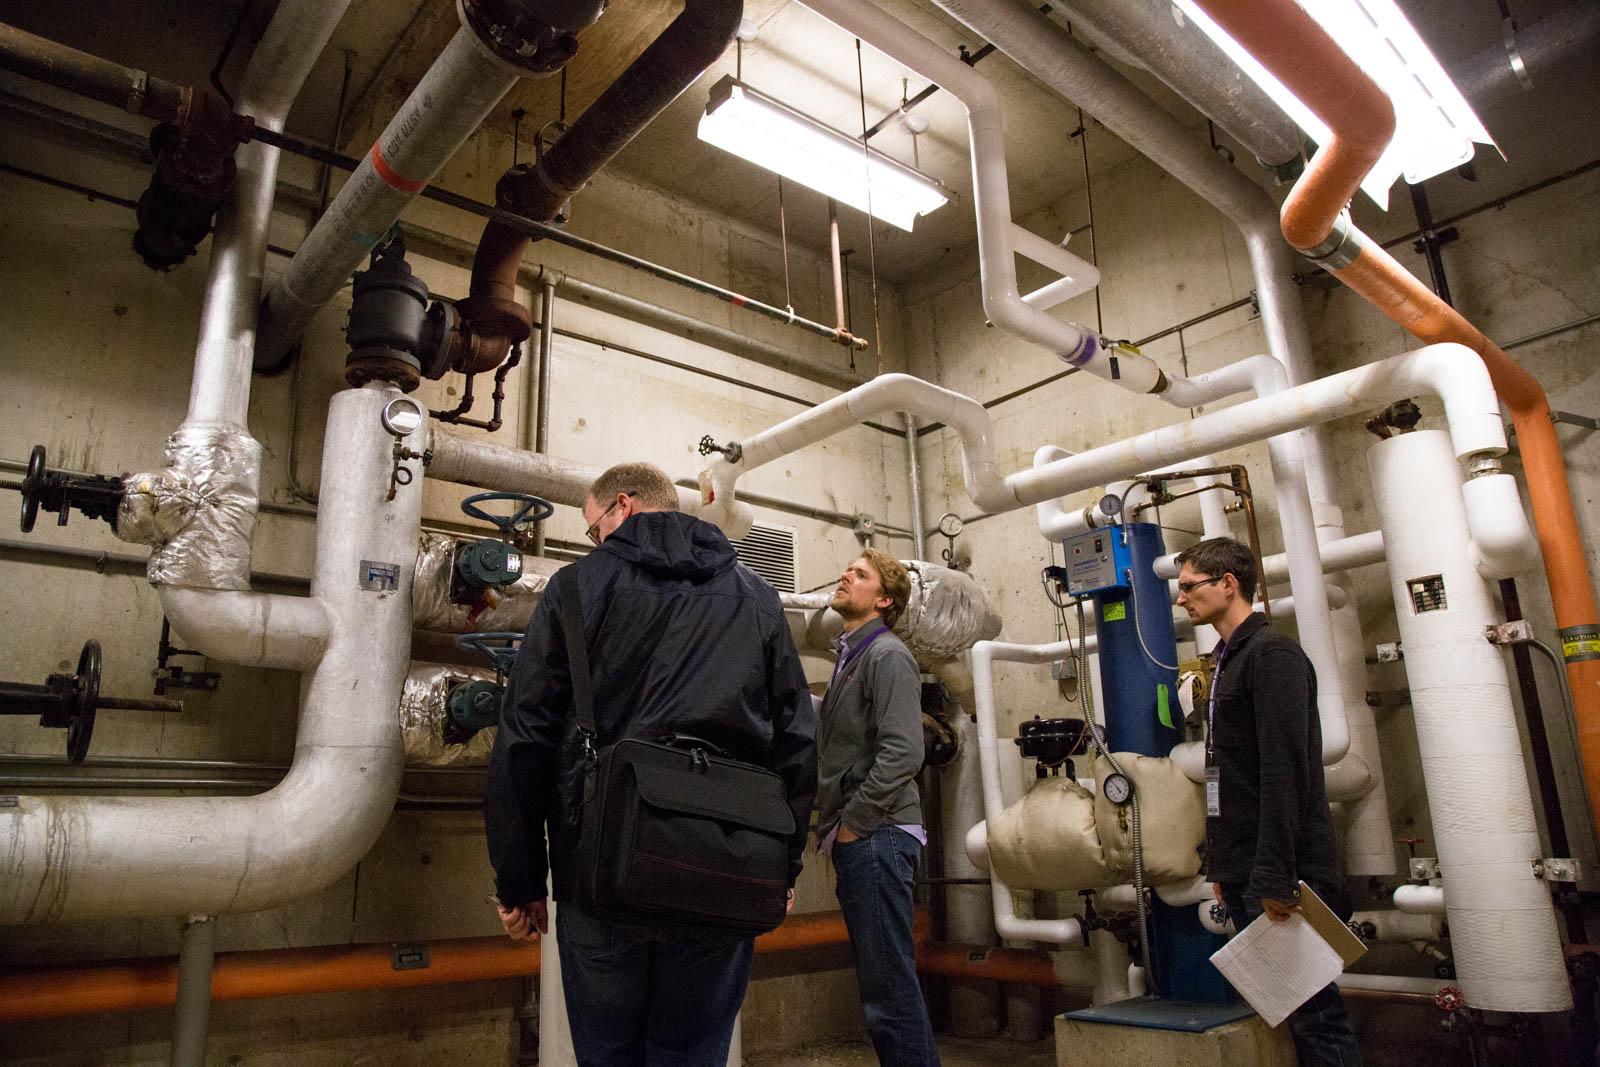 Joe Cook, Erik Turner, and Robert Gaynor in Condon Hall mechanical room